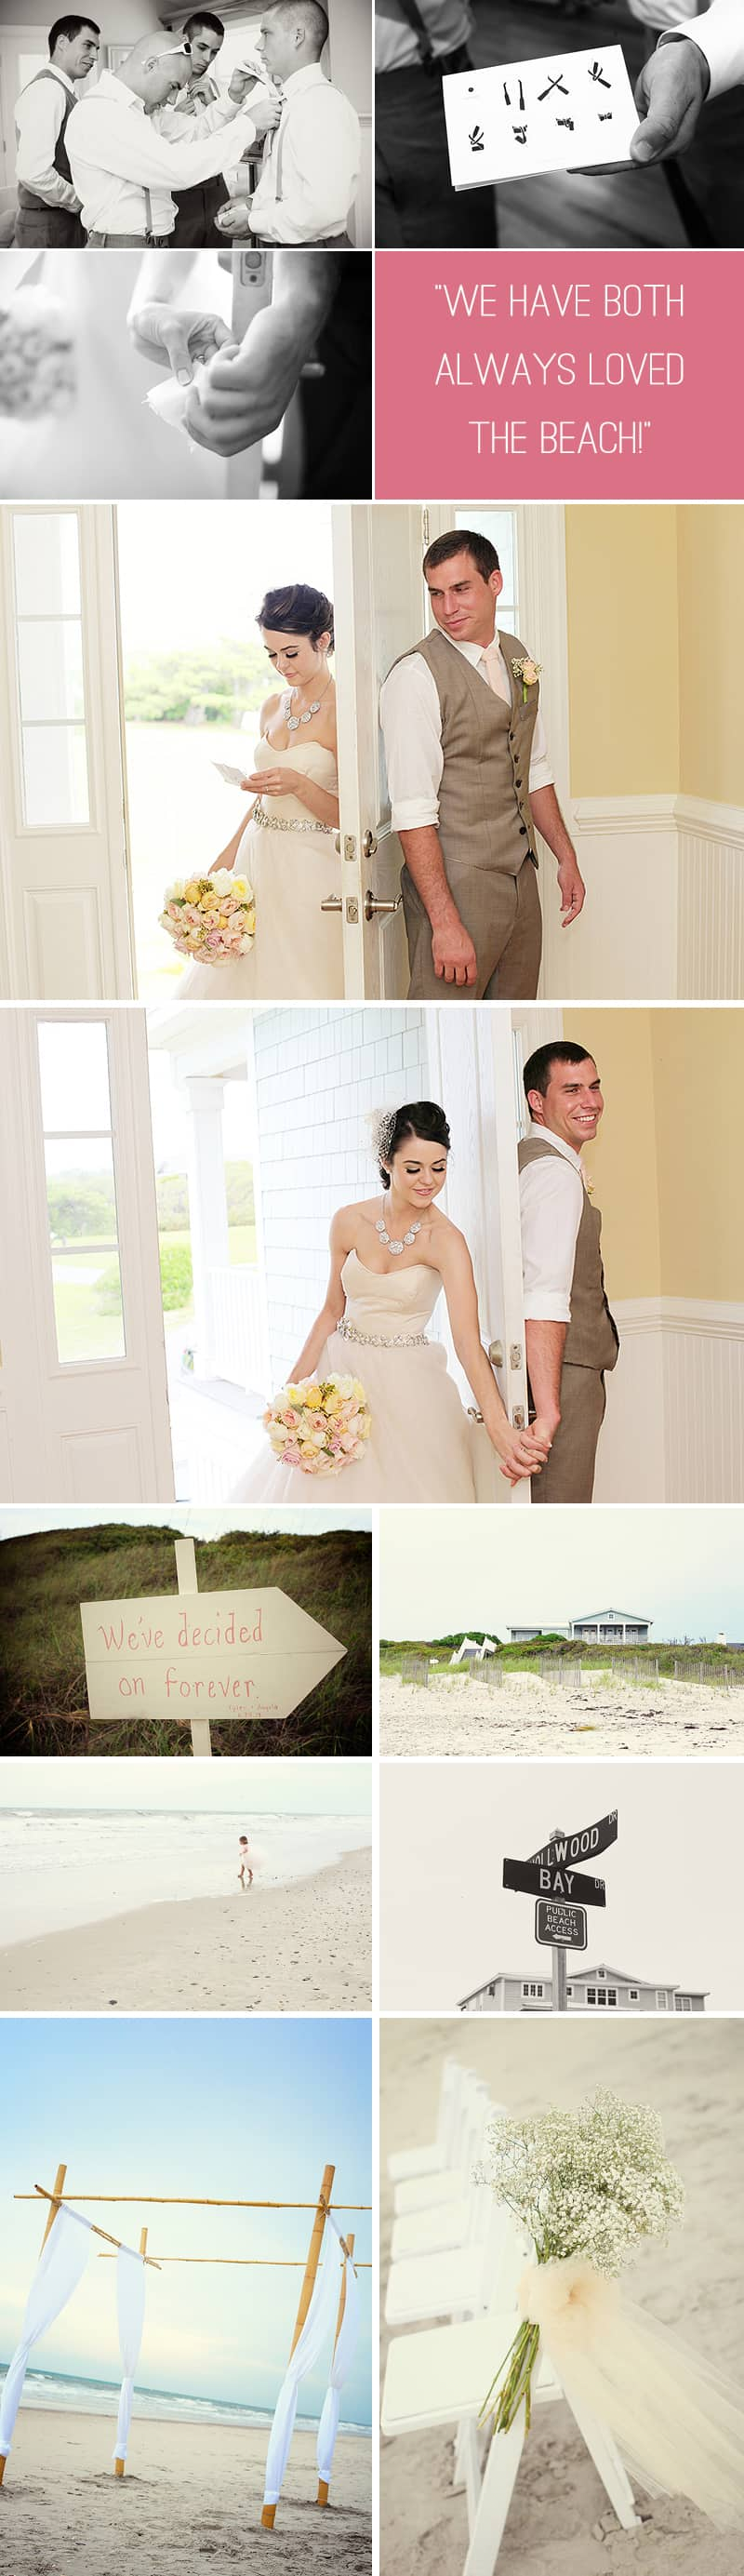 Intimate Beach Wedding First Look